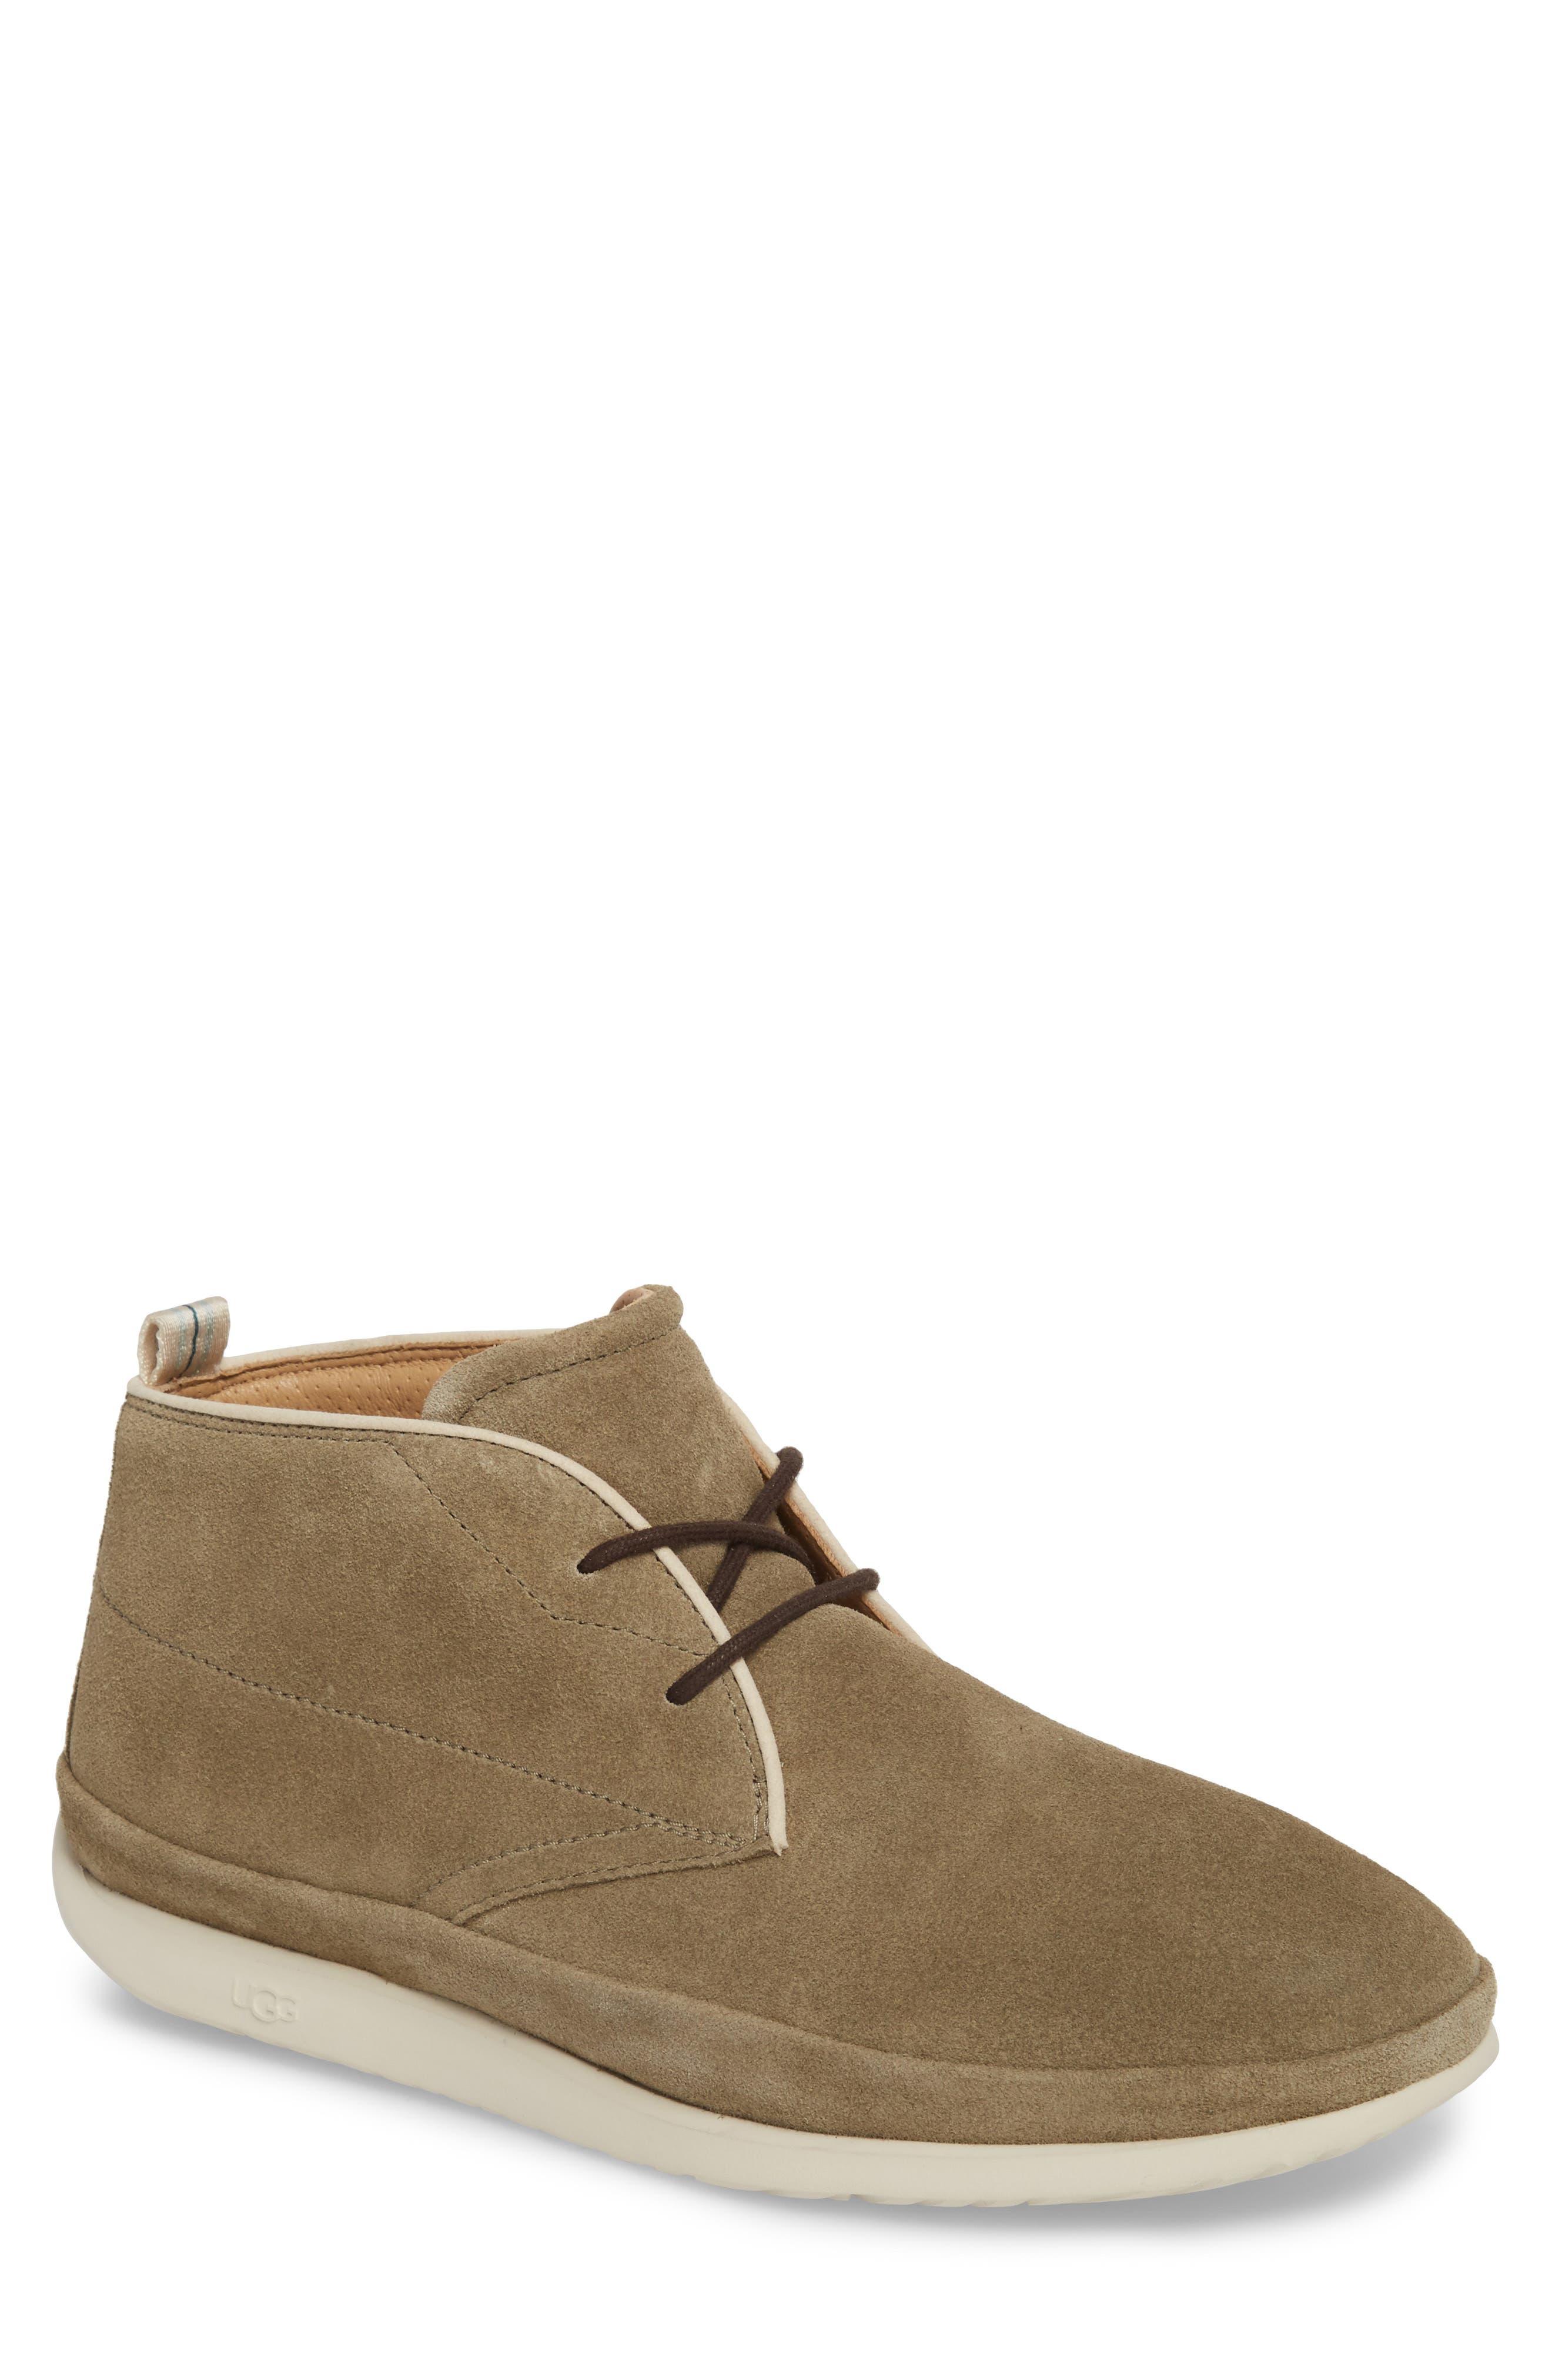 Cali Chukka Boot,                         Main,                         color, Antilope Leather